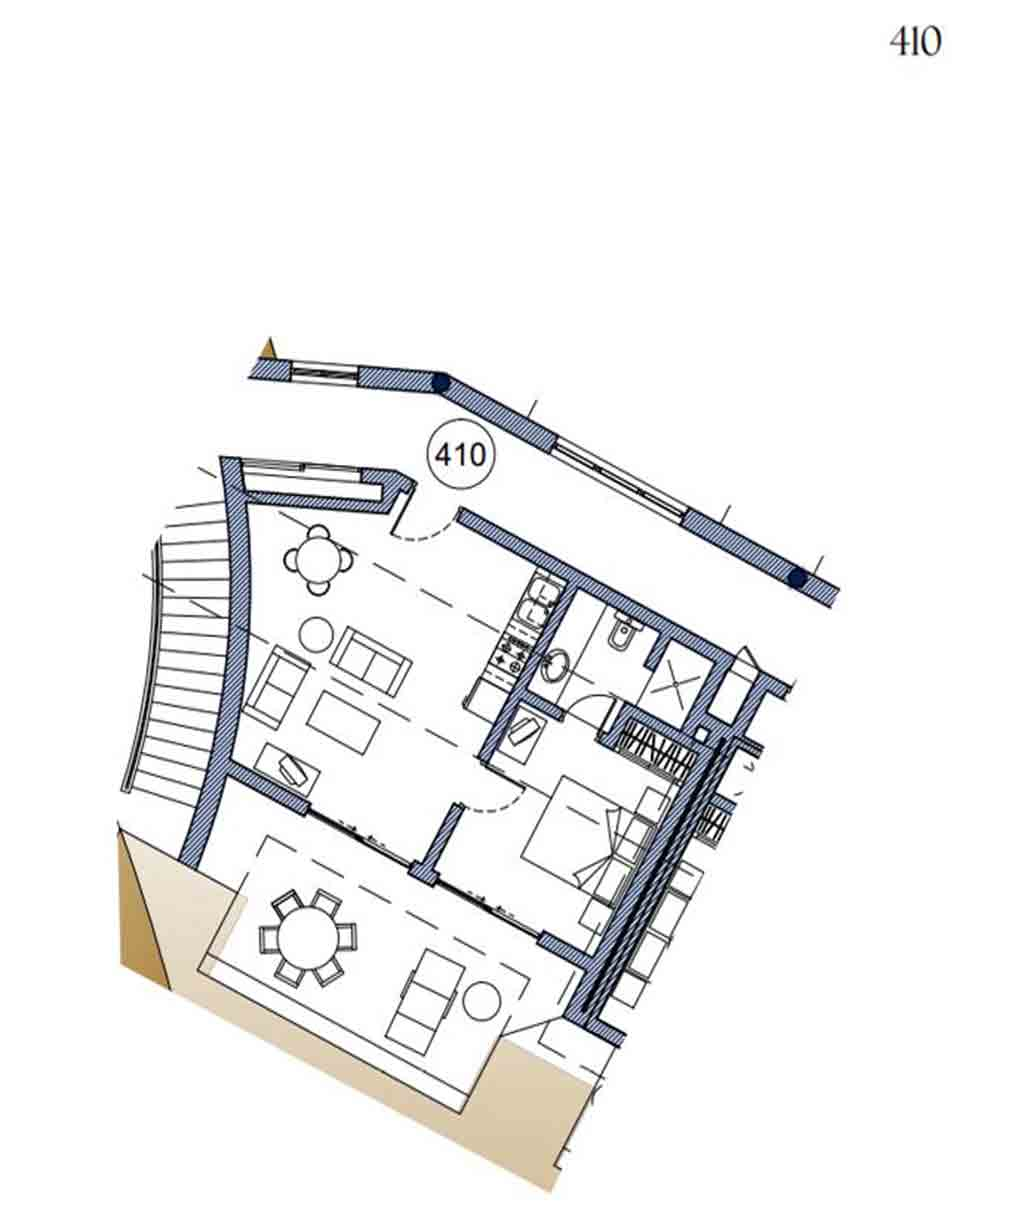 puerto-bahia-floor-plan-design CH-410 (1)JPG